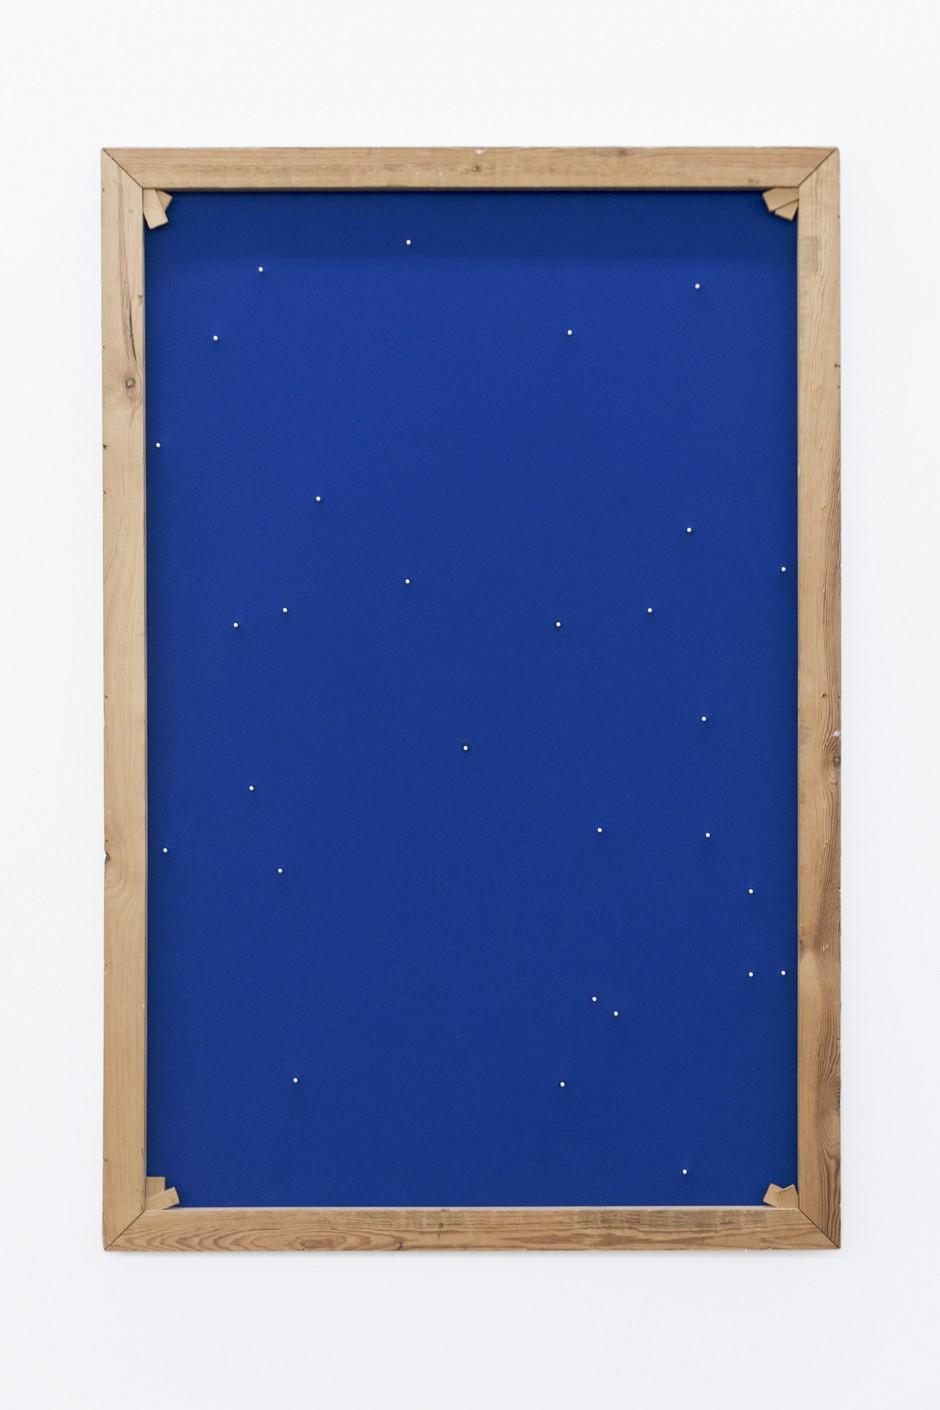 Untitled - Toon Boeckmans